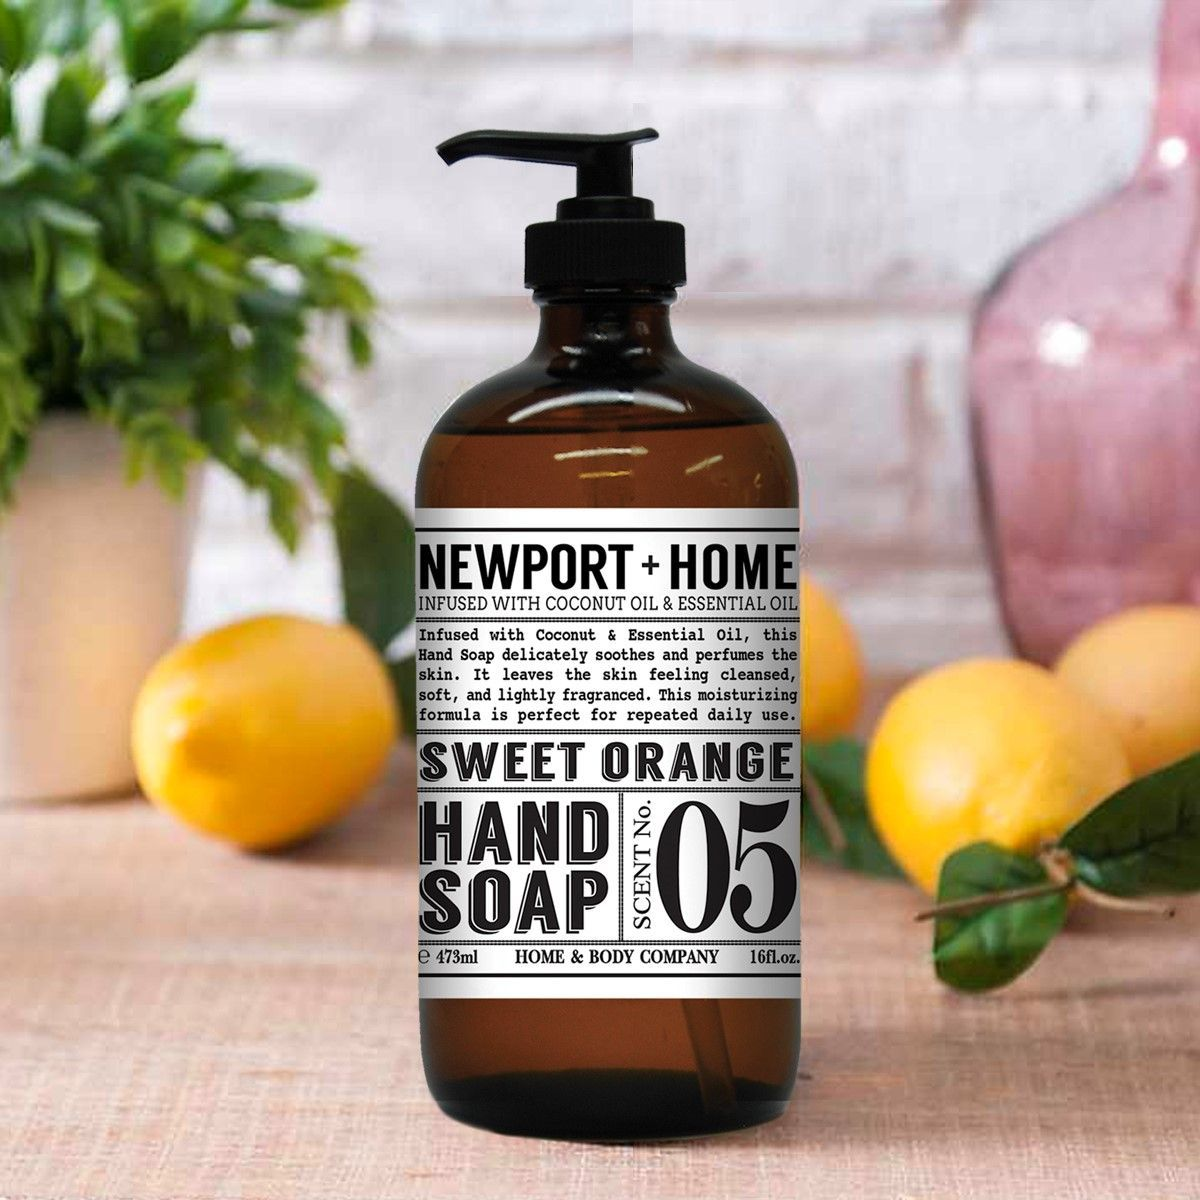 Newport hand soap bottle on table